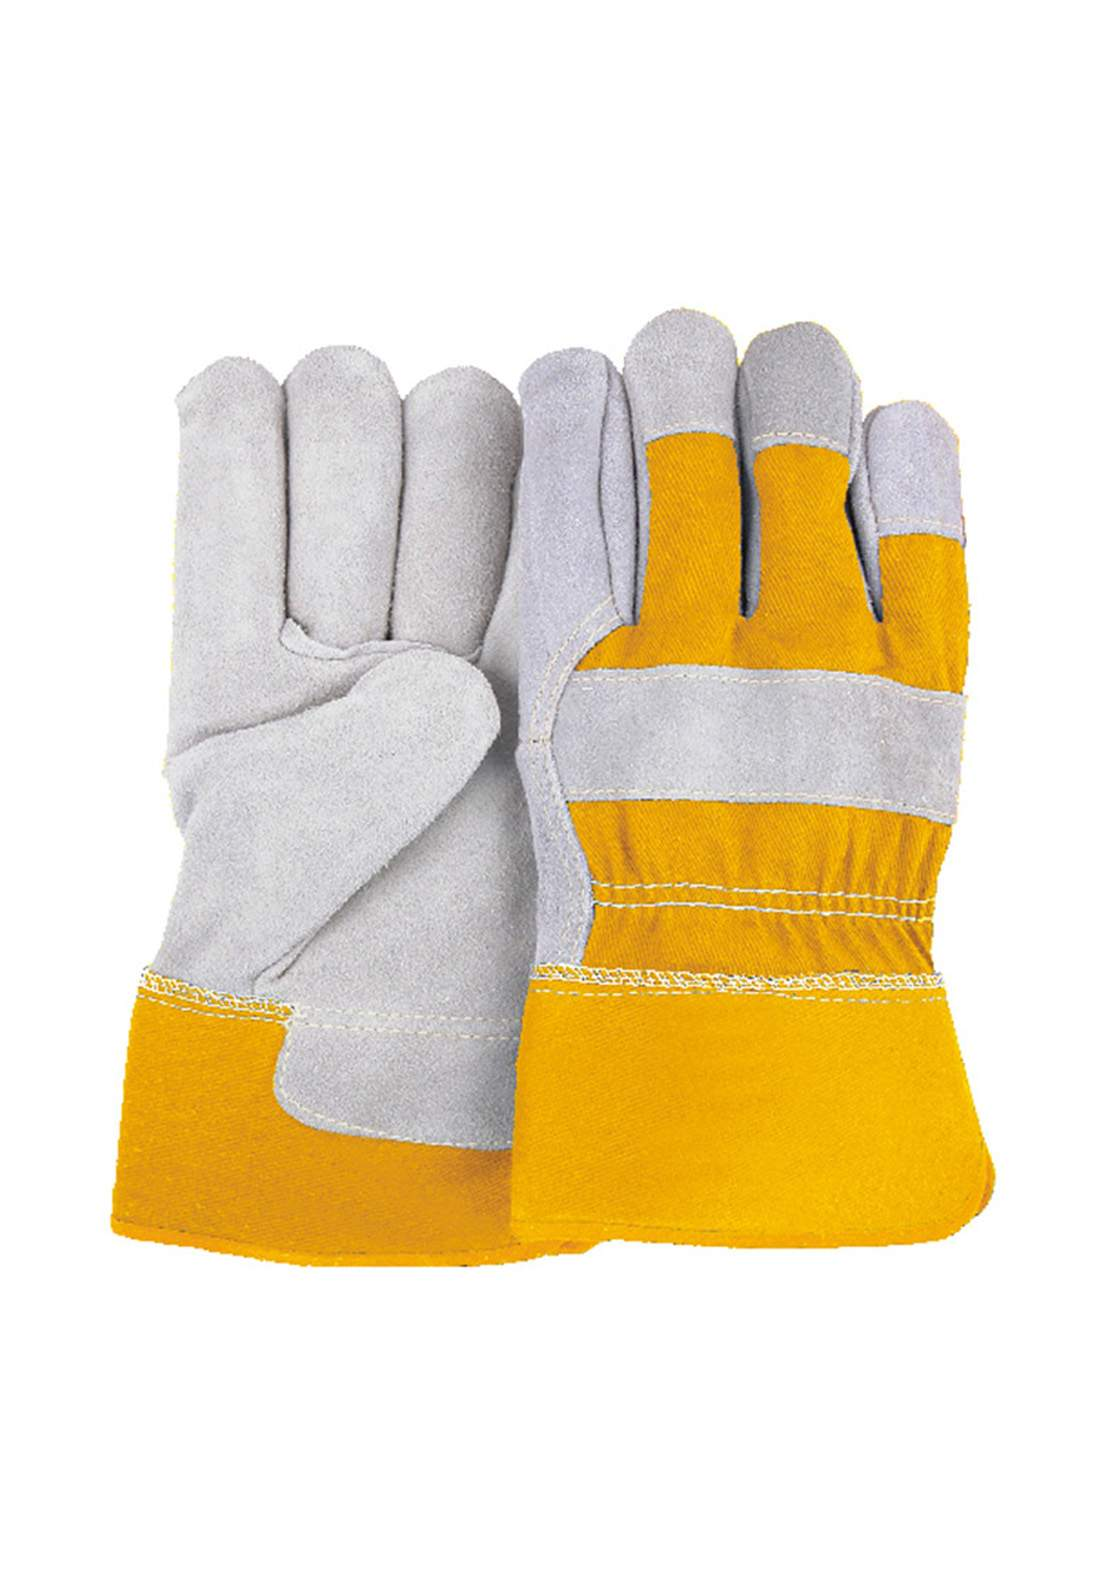 Subul AlHurra Safety Gloves قفازات السلامة